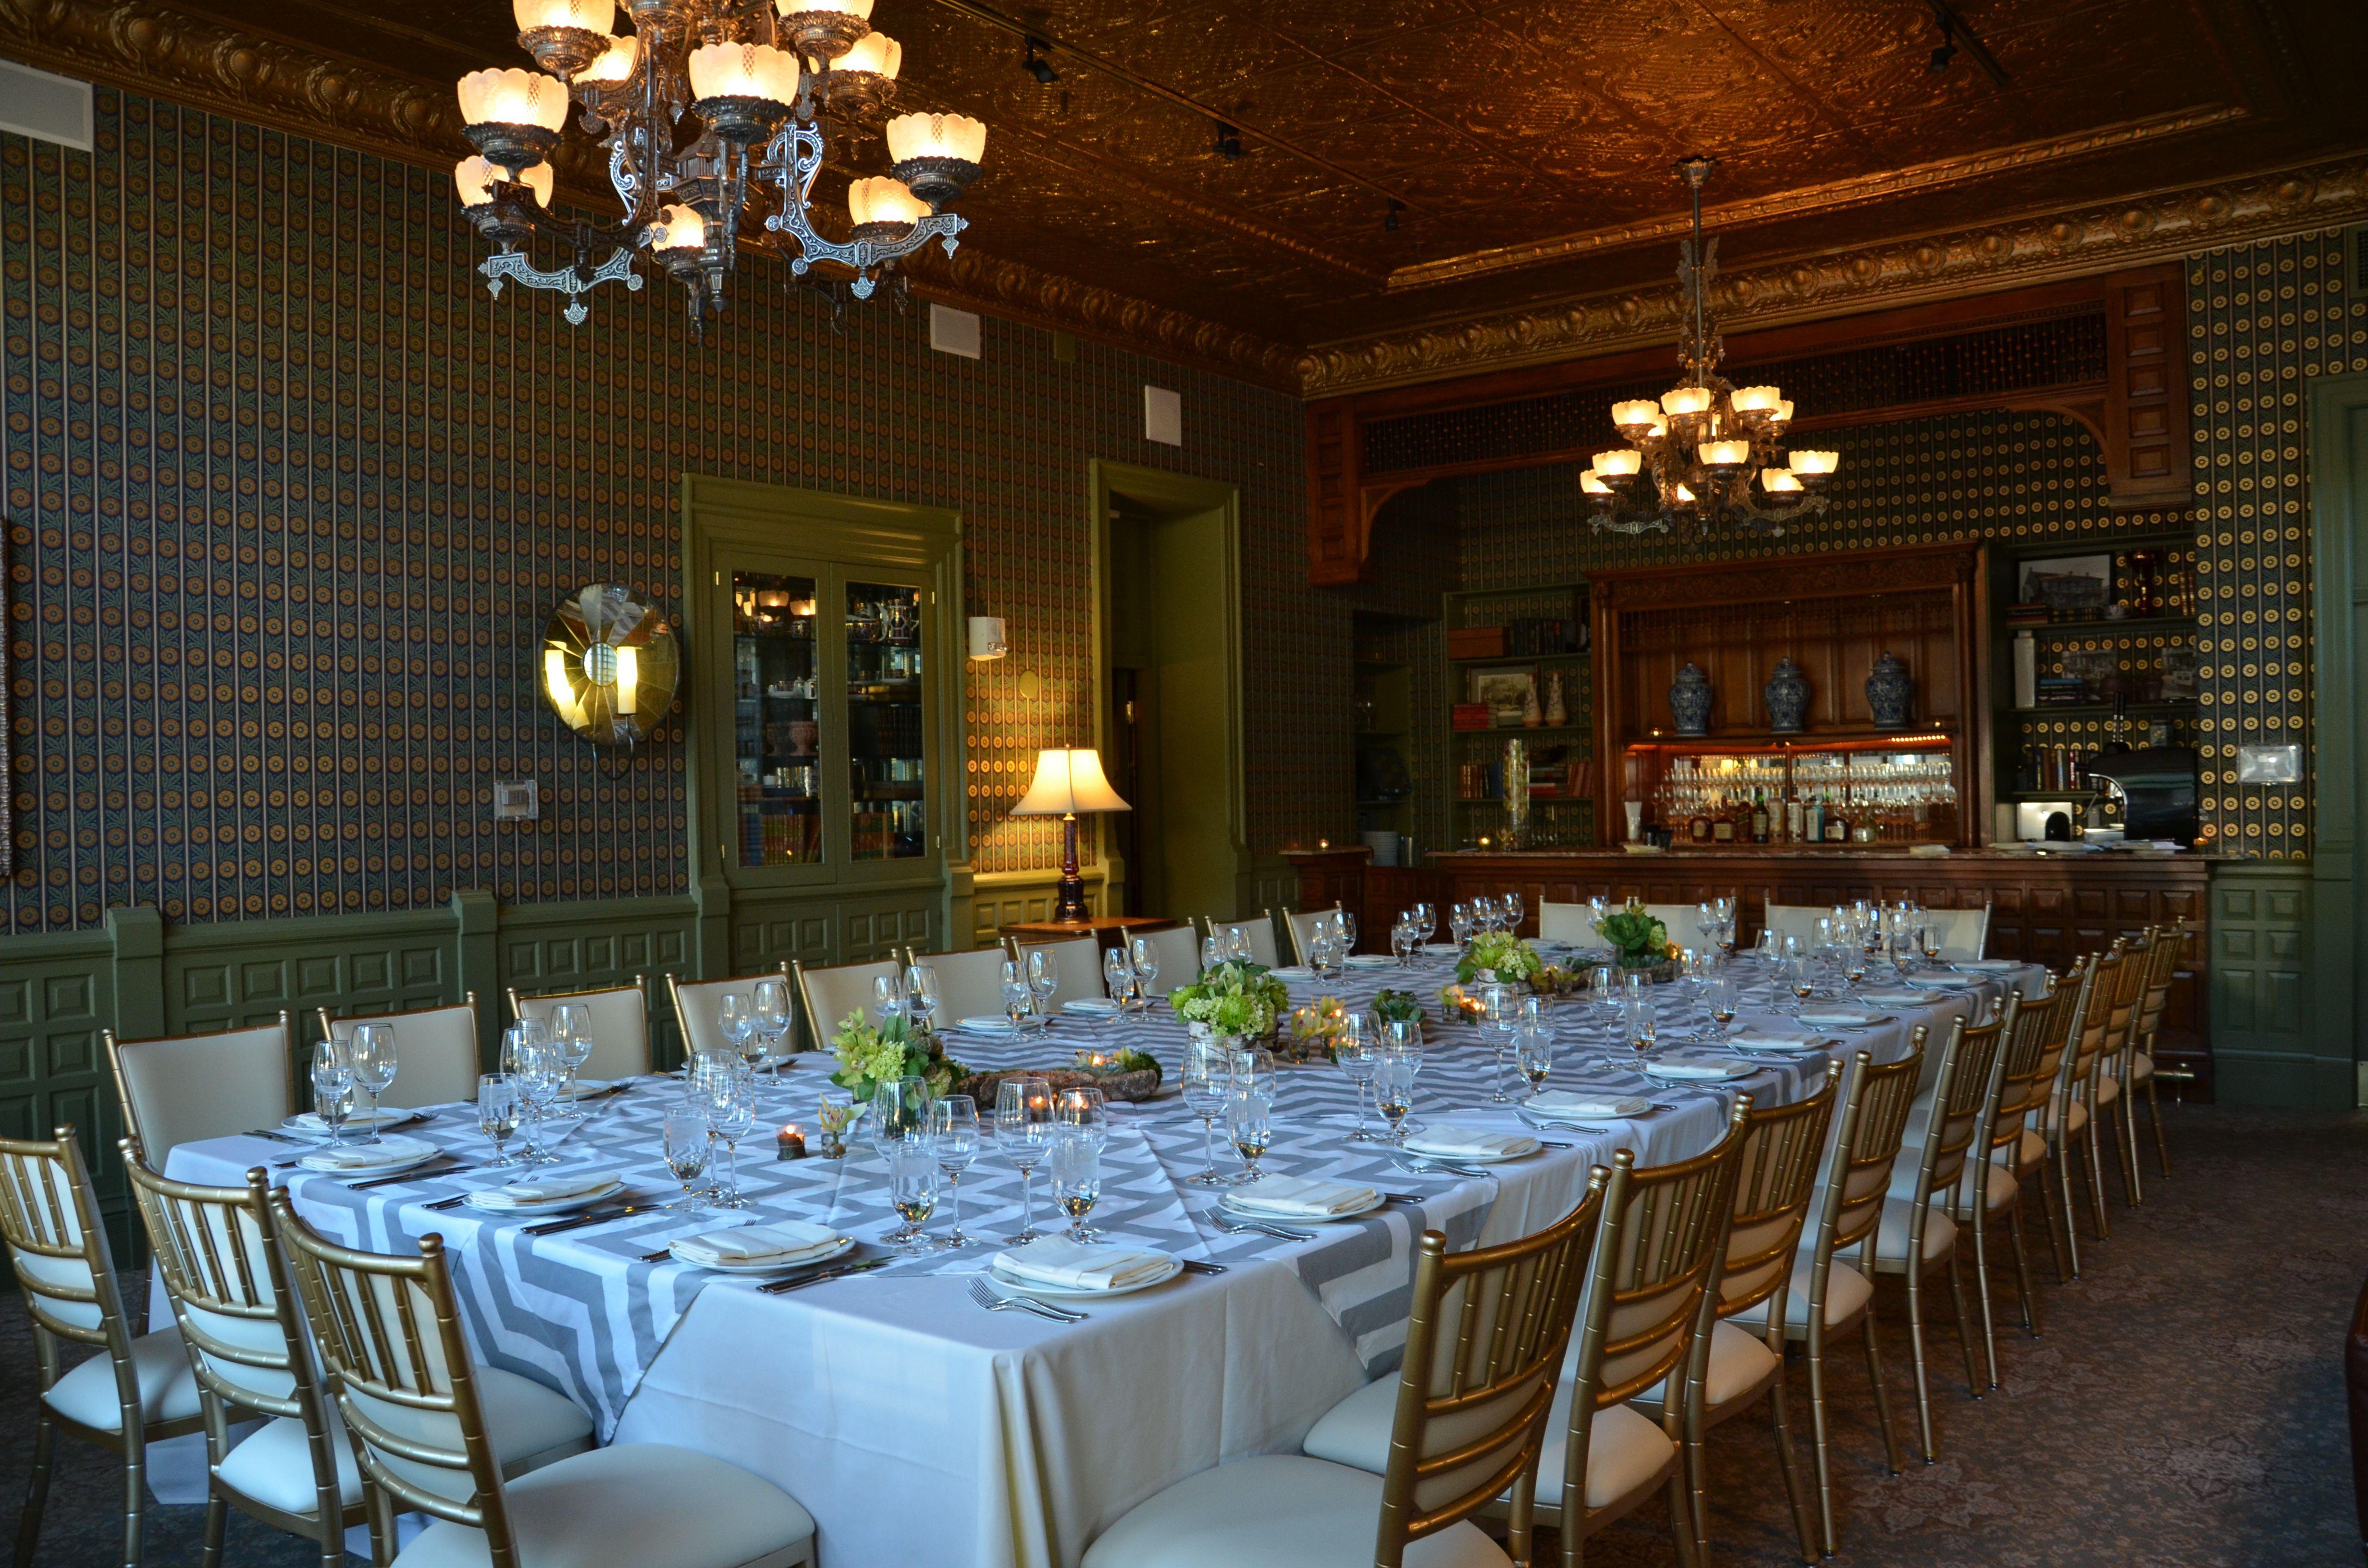 Aspen Meeting Rooms Aspen Events Table Decorations Home Decor